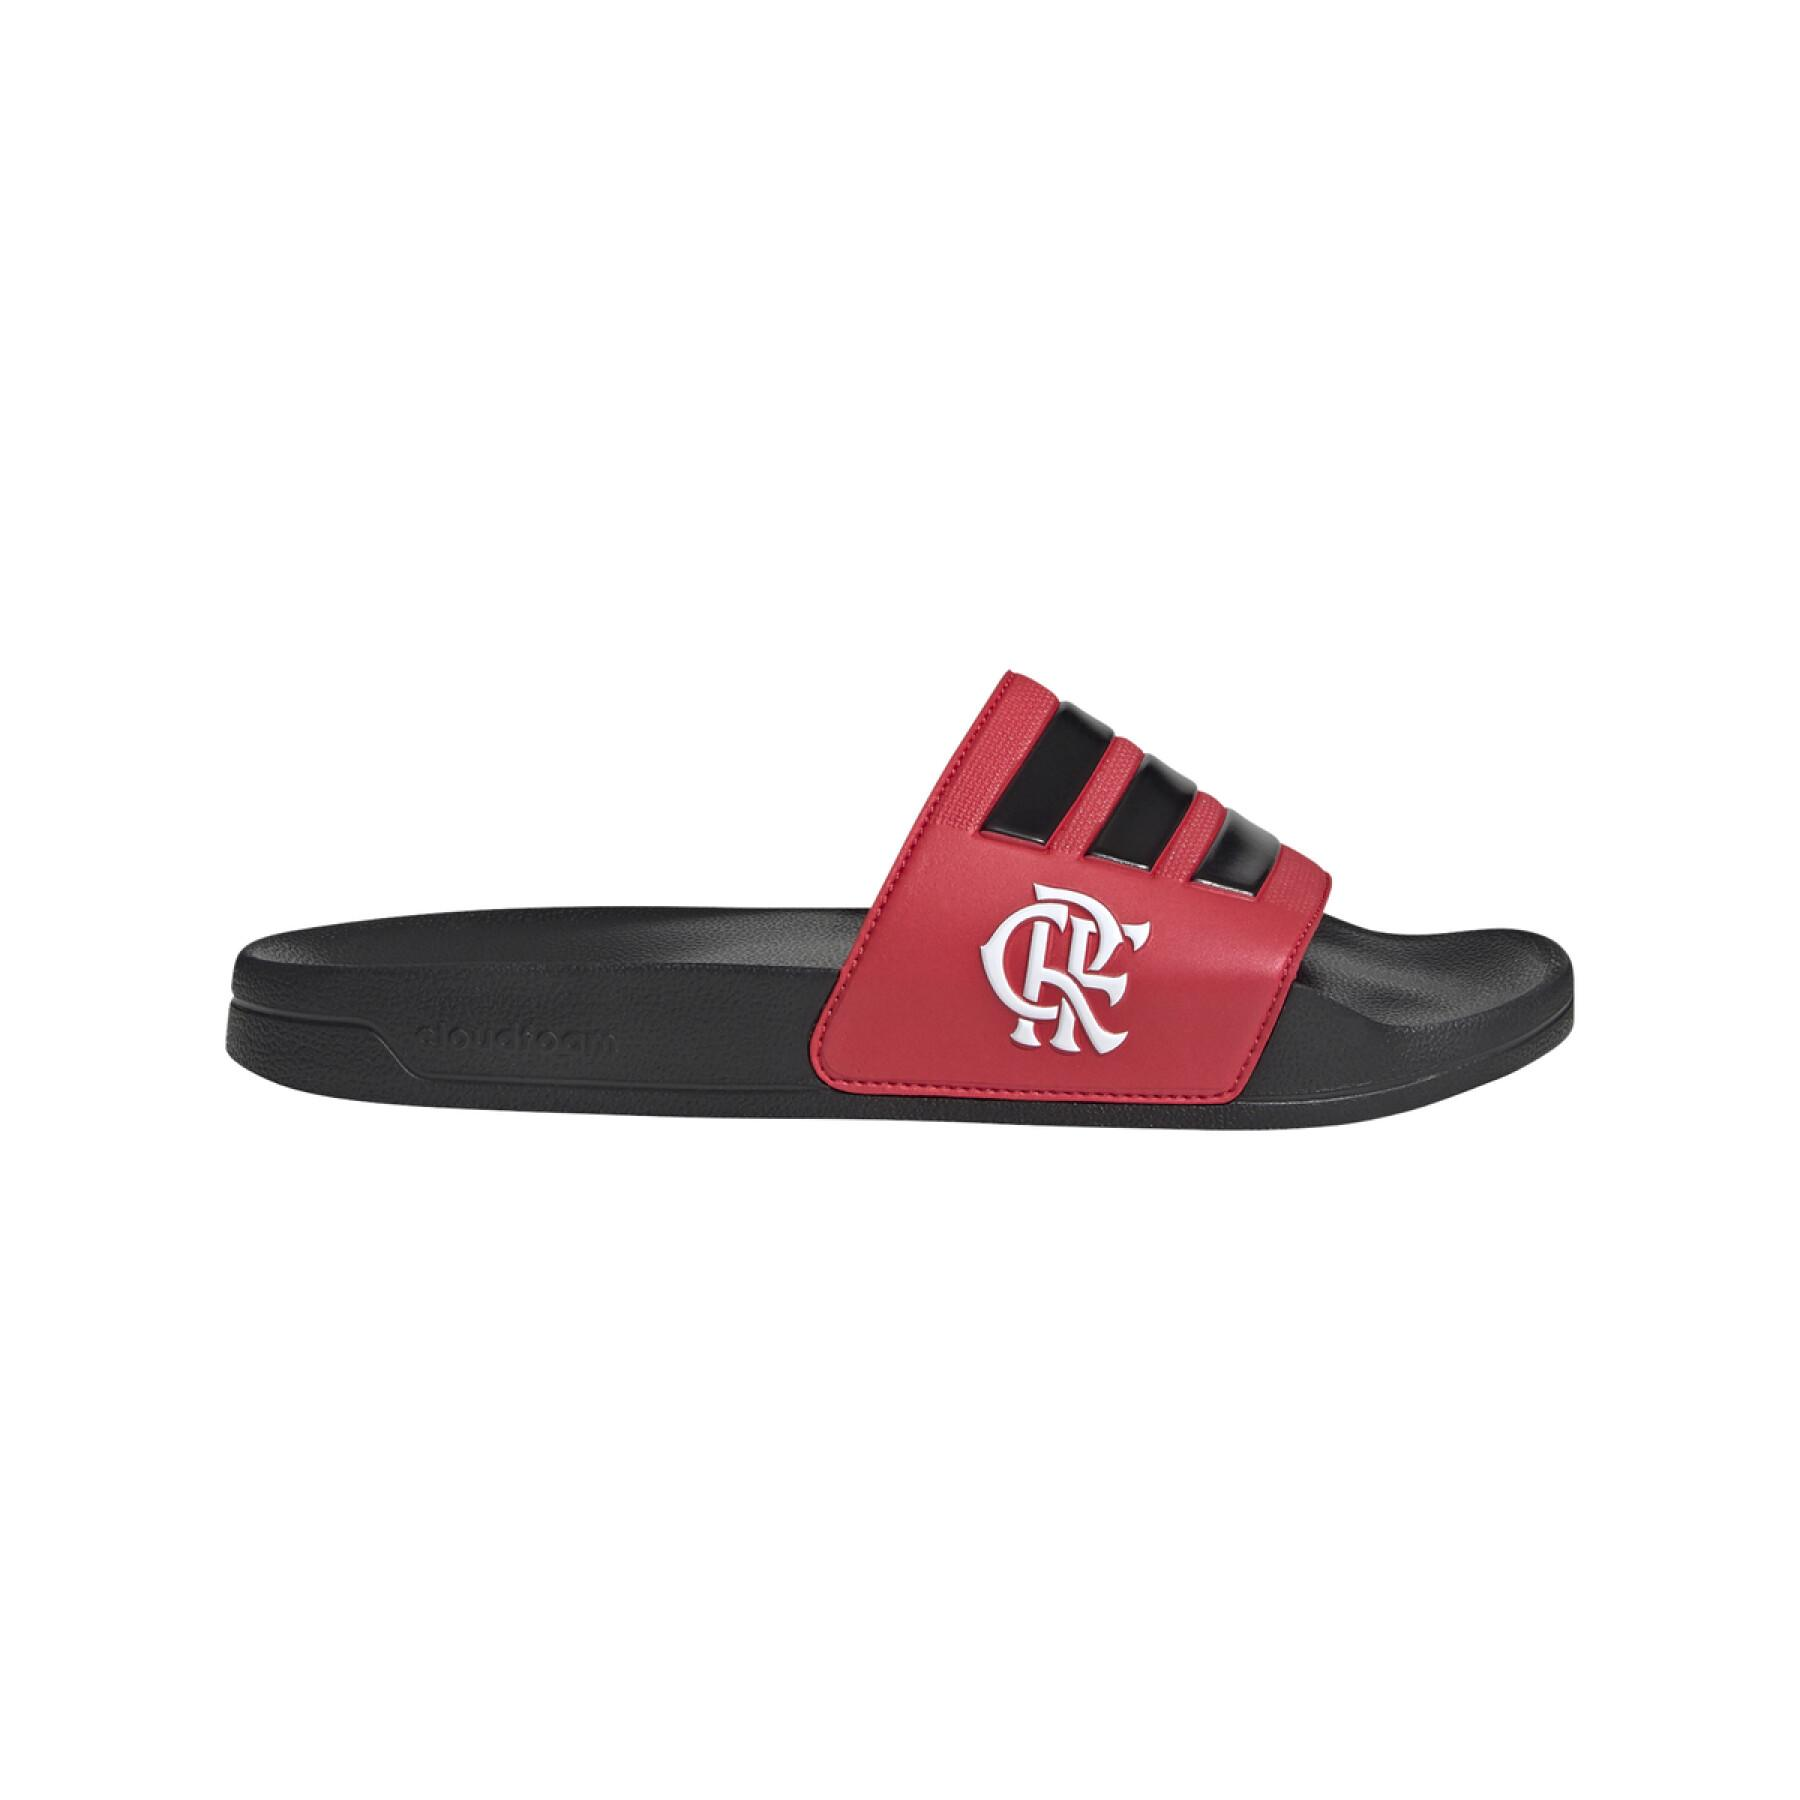 adidas Adilette Shower Sandals